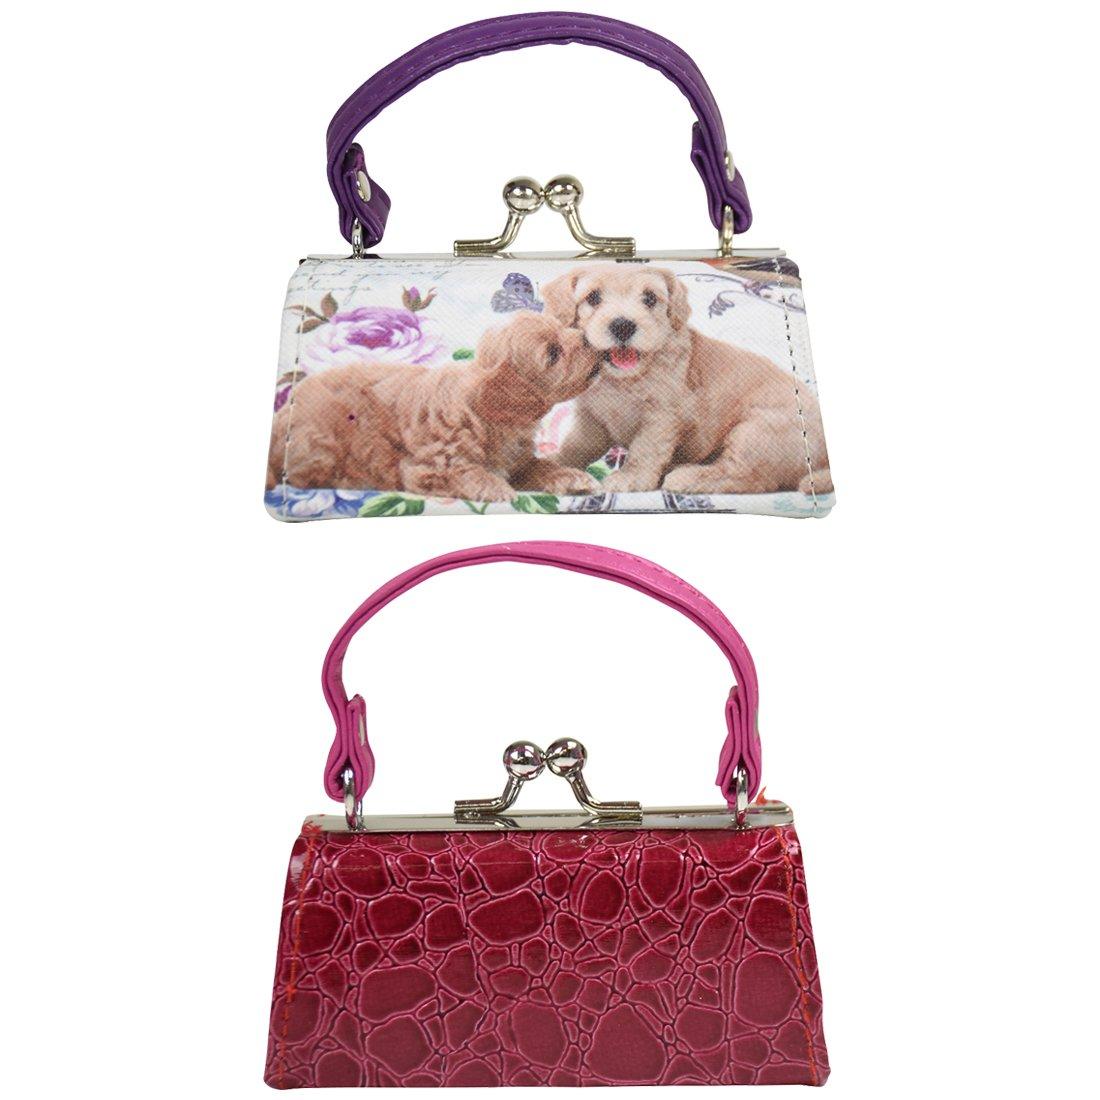 2 Lipstick Cases with Handles Mini Mahjong Coin Purse - Hot Pink Purple Crocodile Doggie